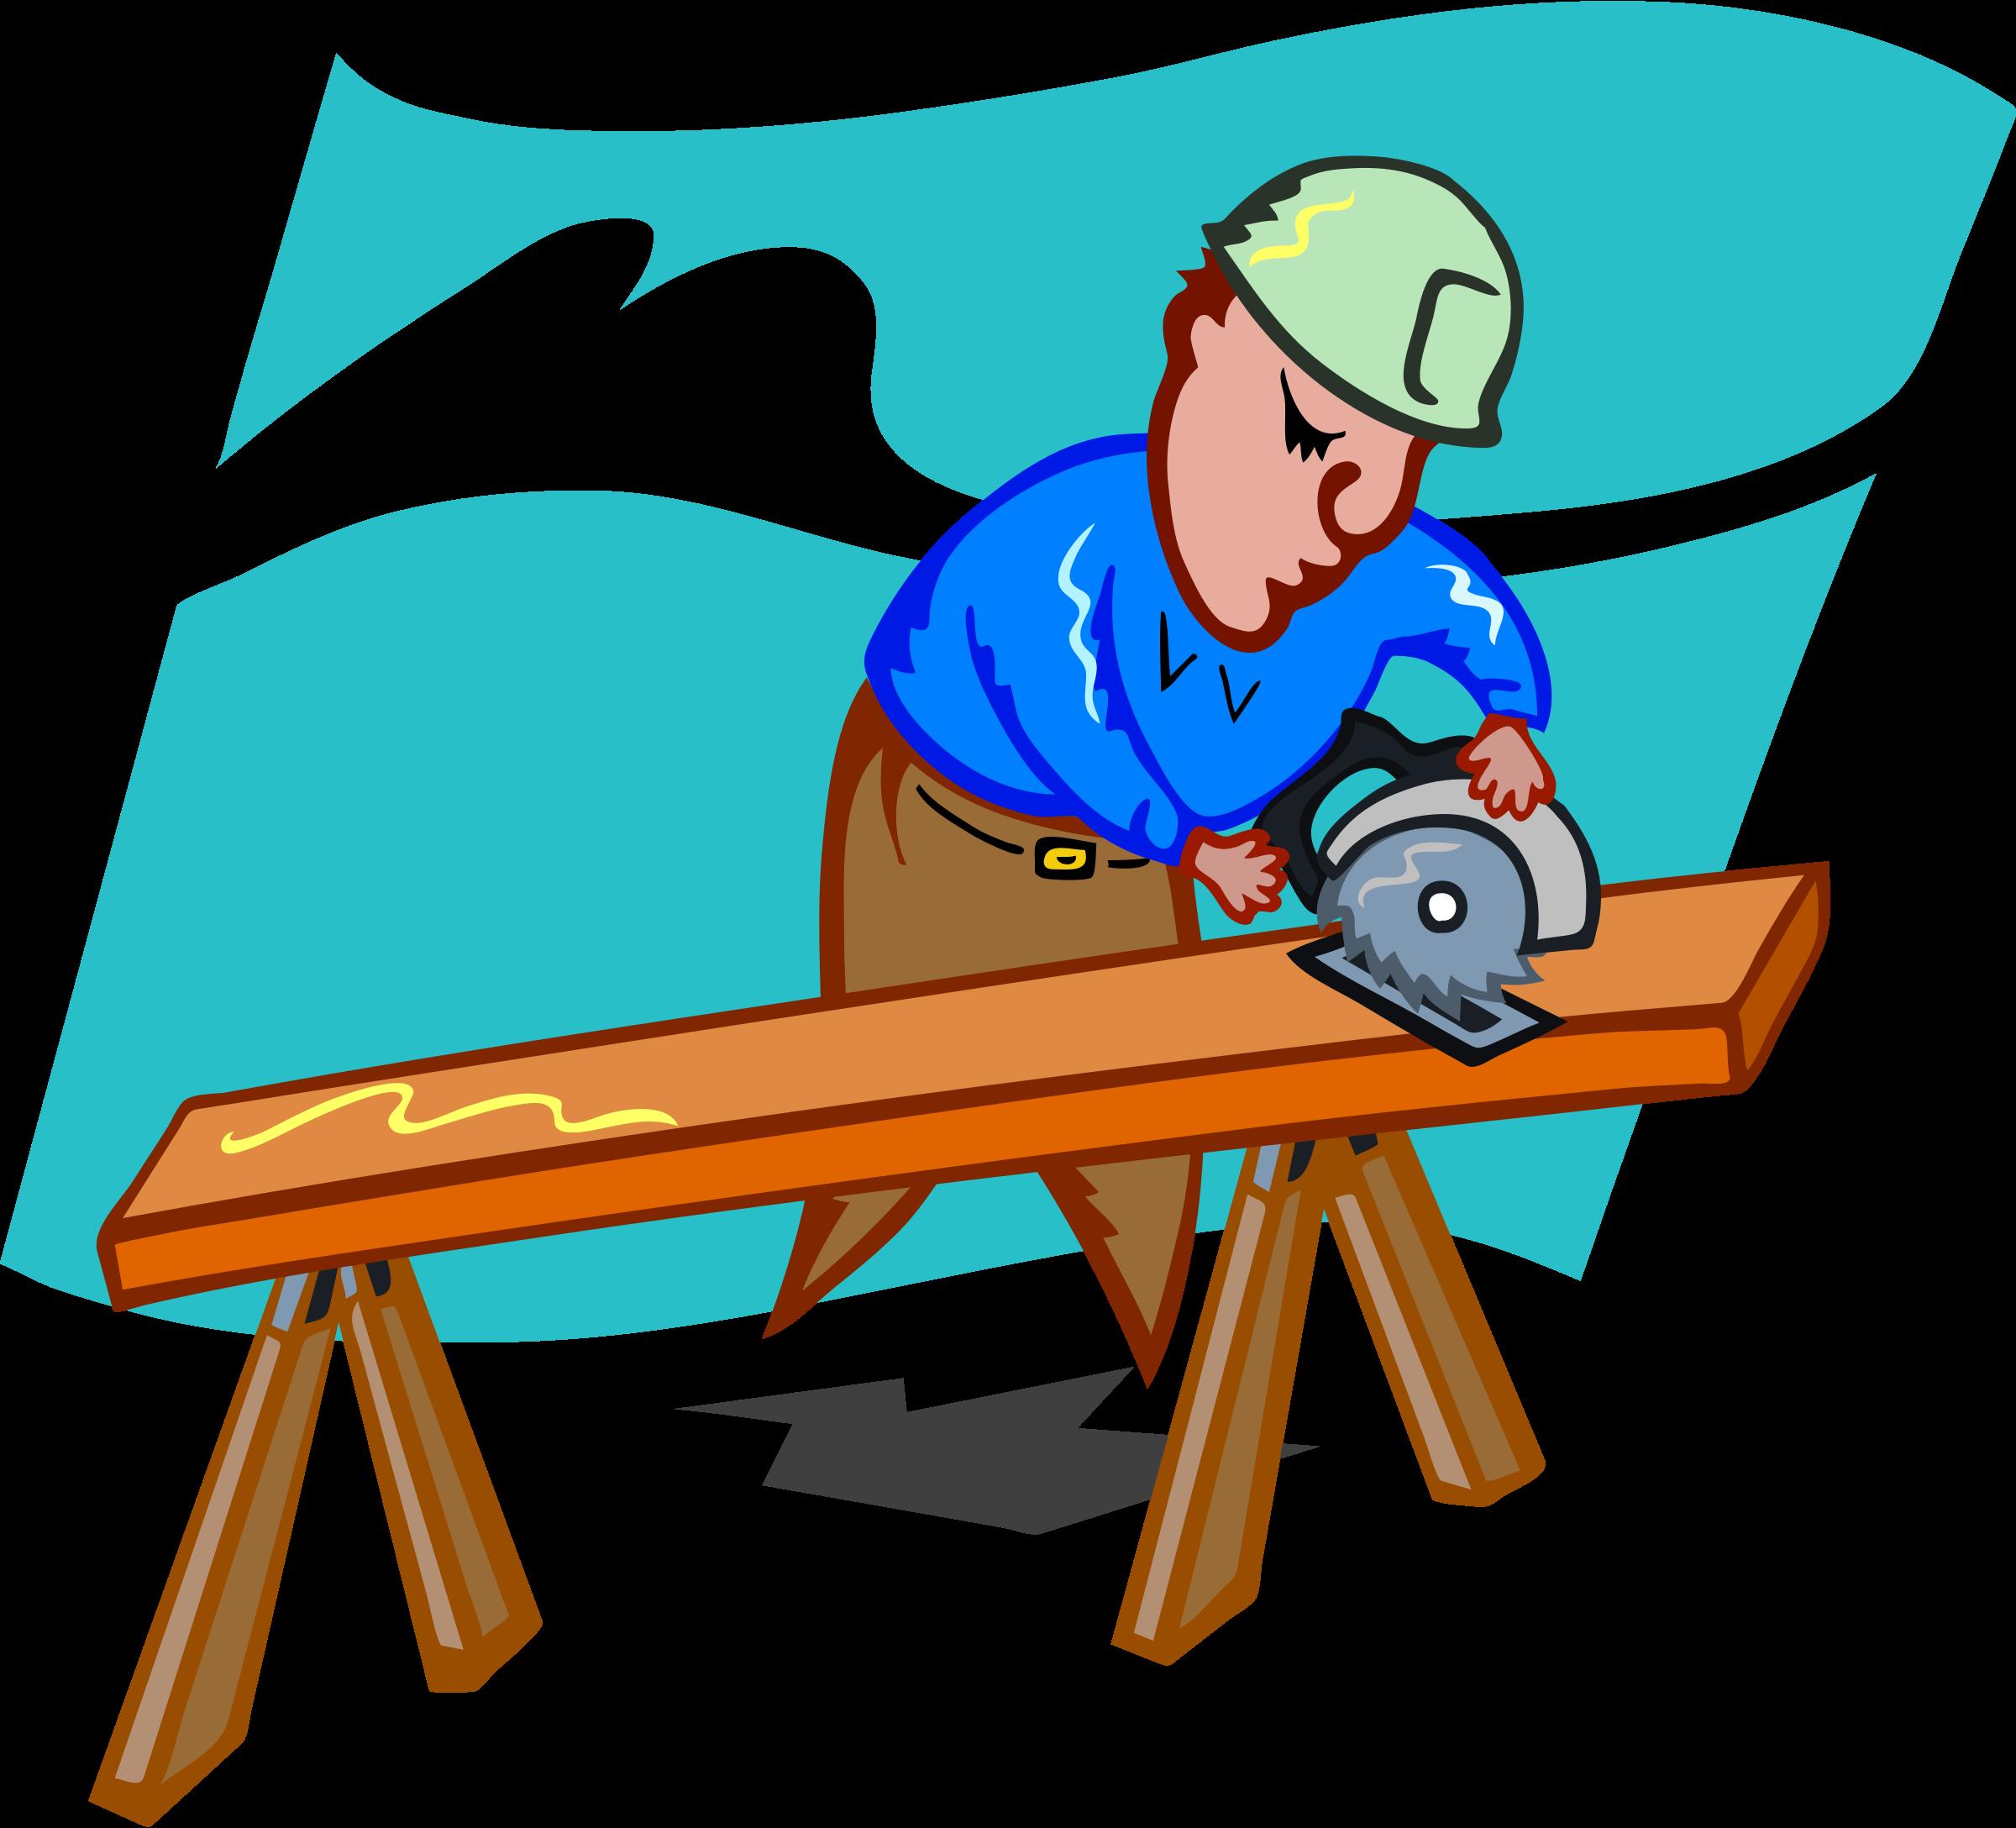 Tools clip art free. Carpenter clipart carpentry